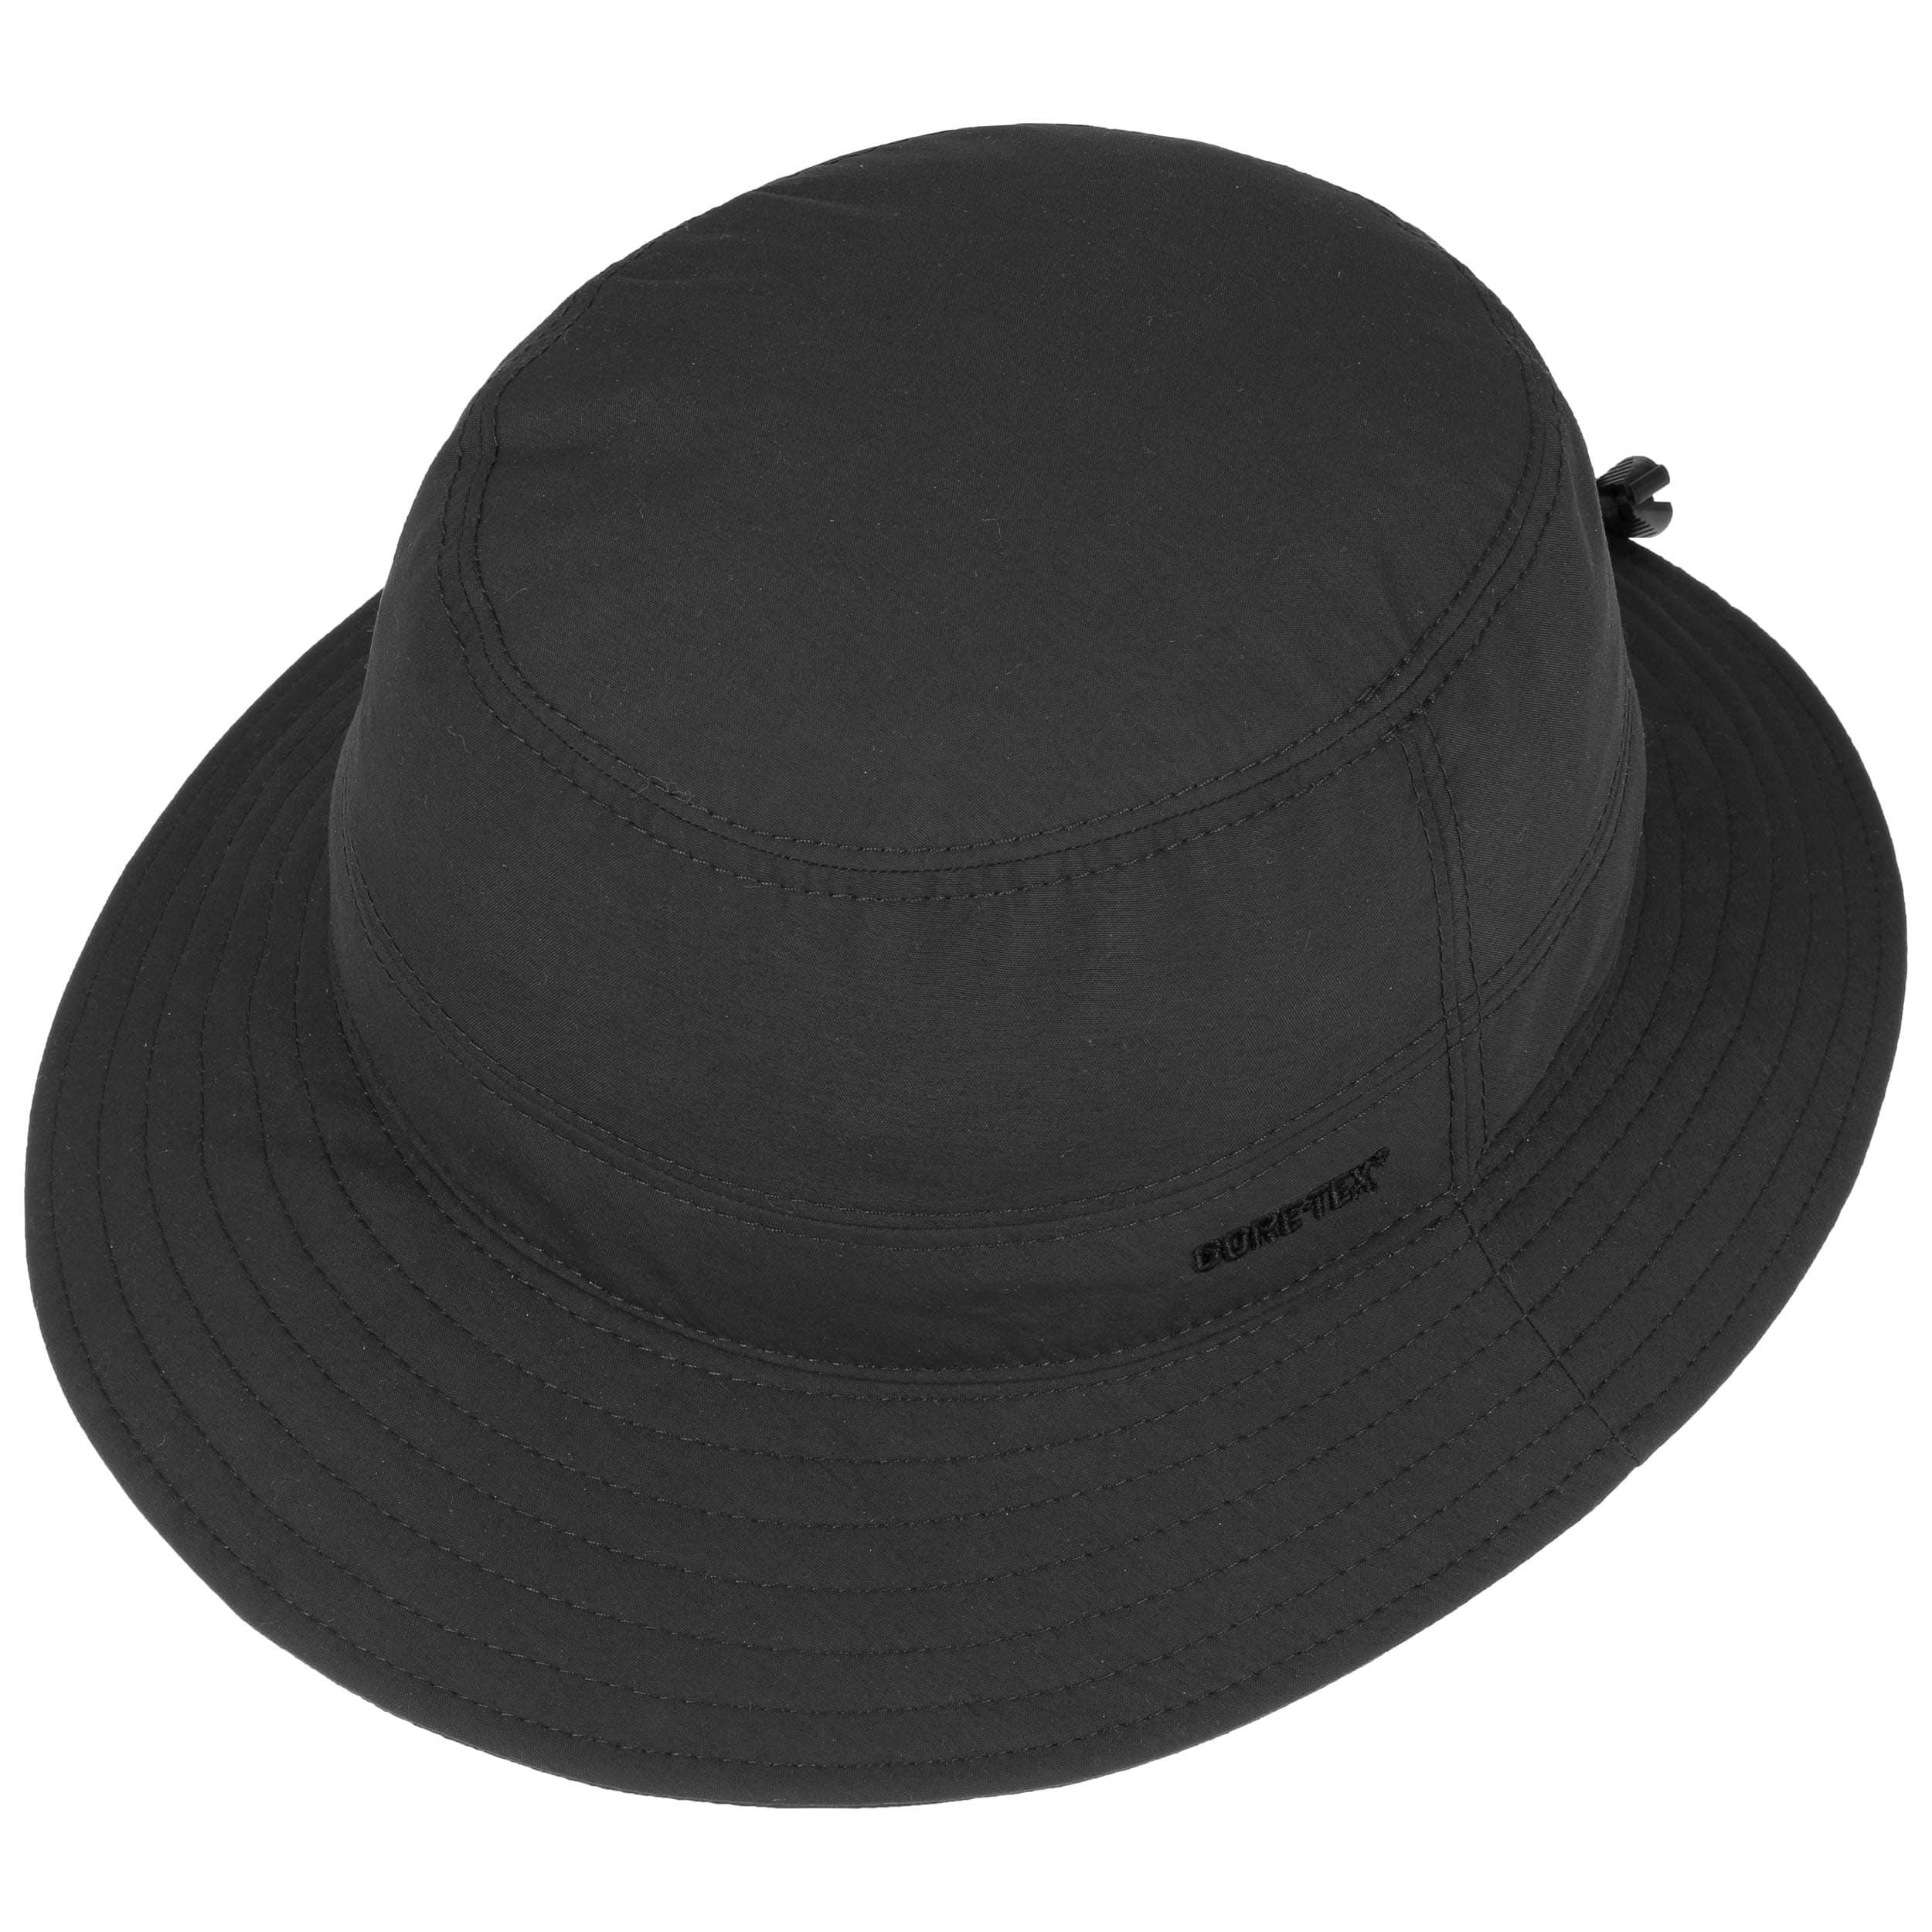 Gore Tex Golf Rain Hats - Hat HD Image Ukjugs.Org 29b2e50740c